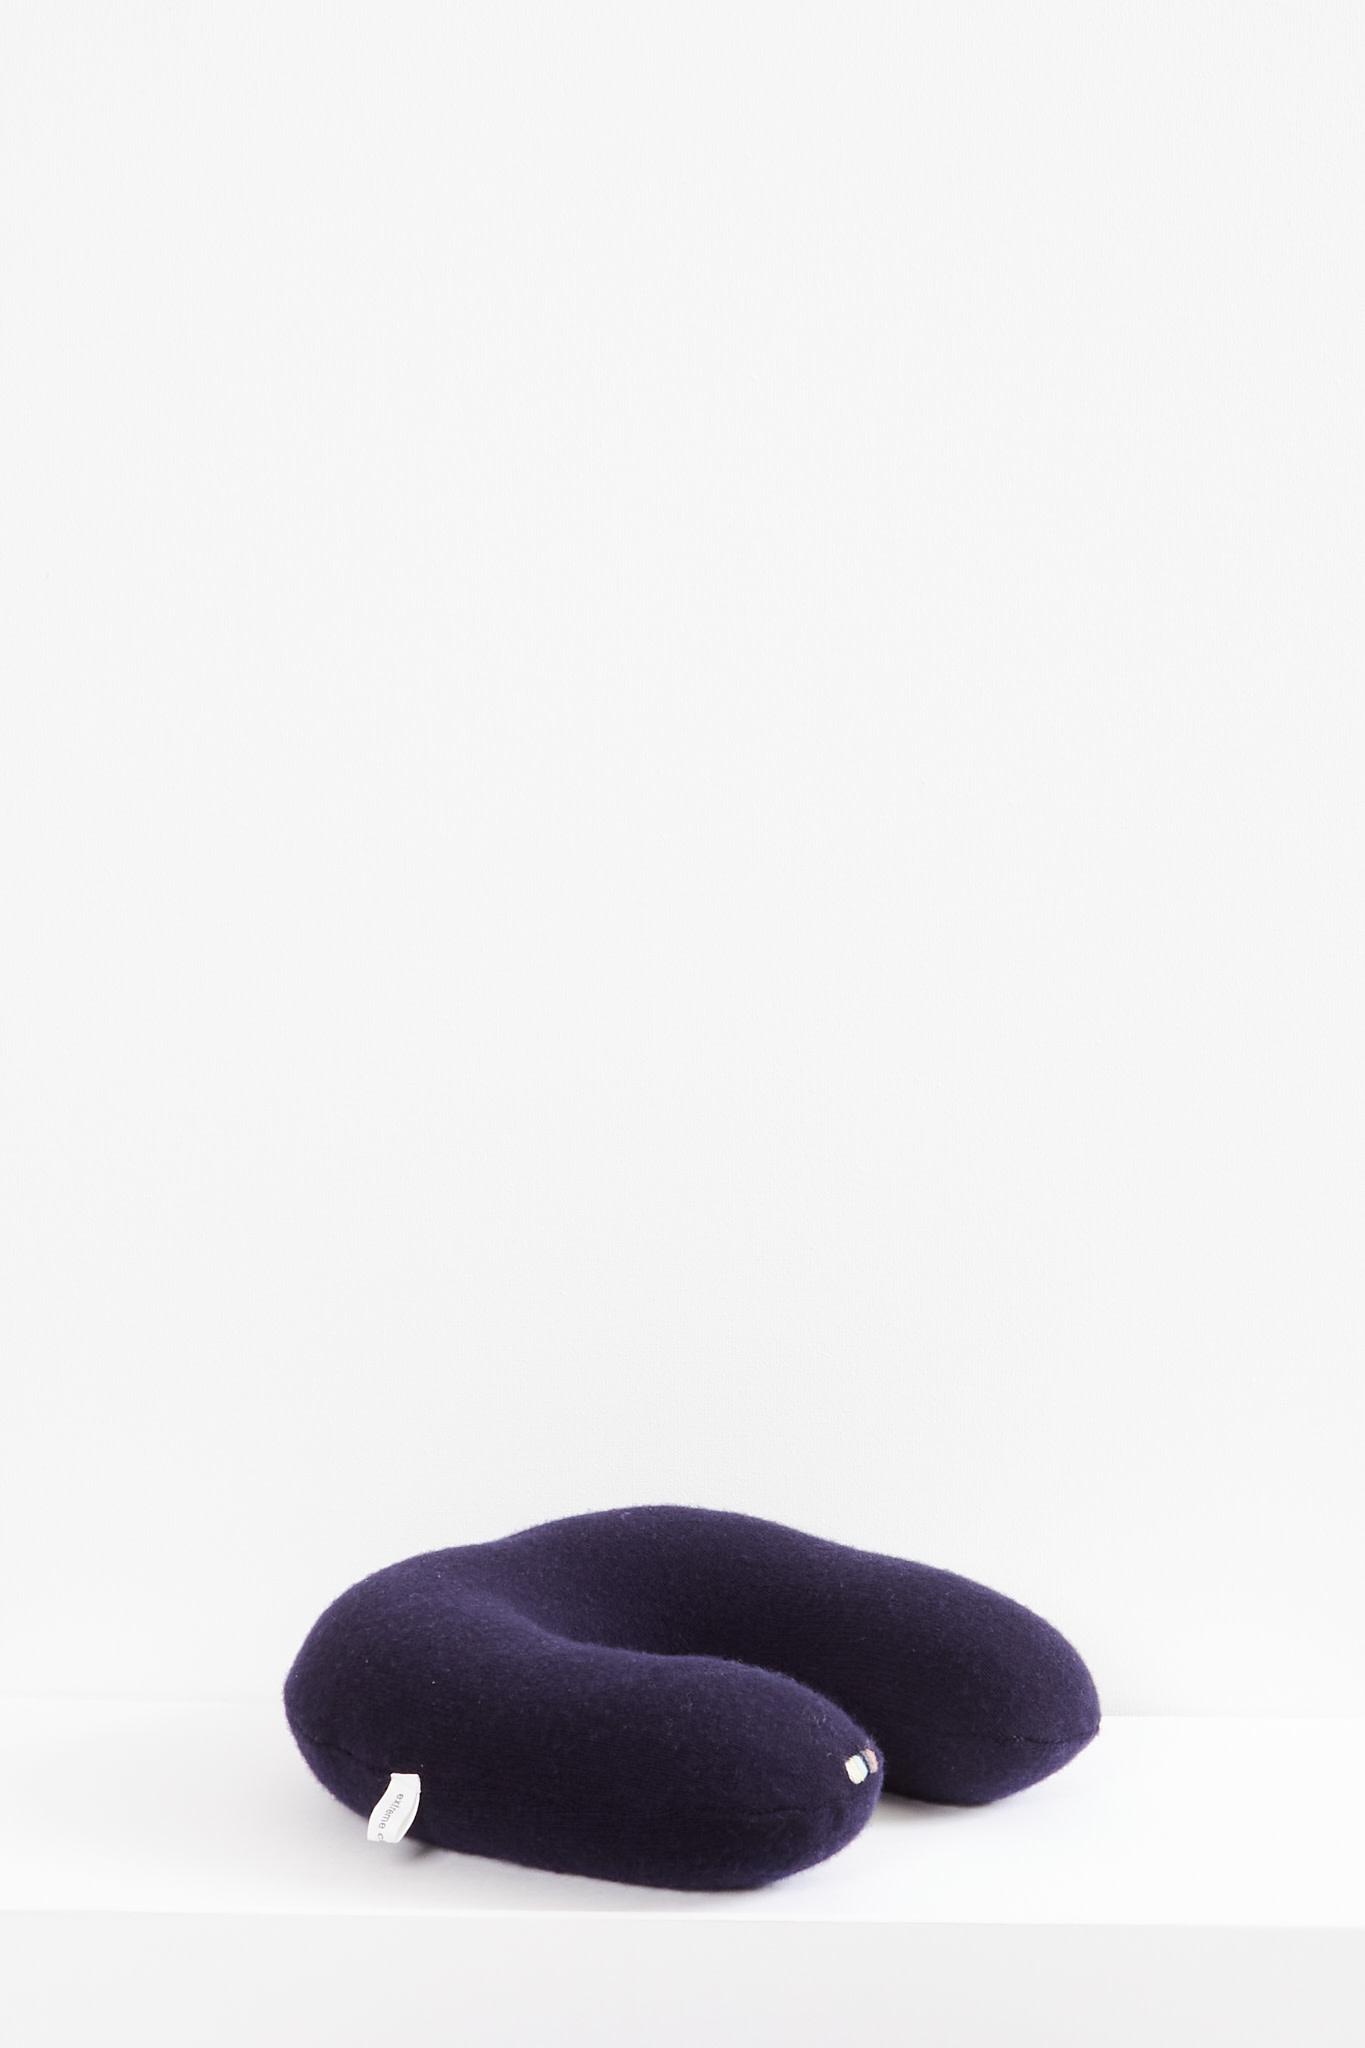 extreme cashmere - No131 puff colar